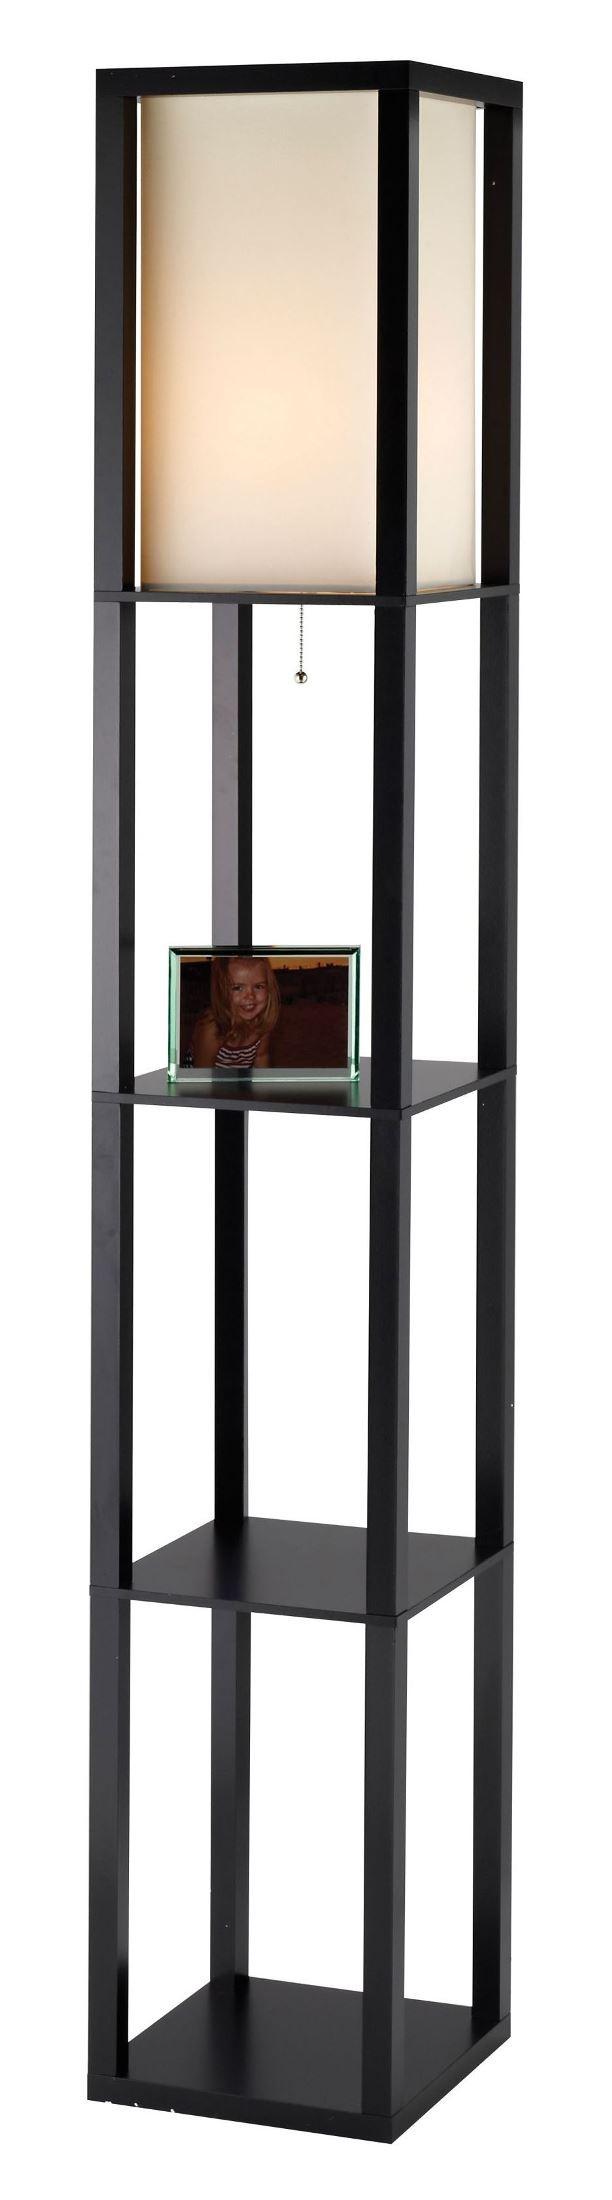 Titan Black Tall Shelf Floor Lamp From Adesso 3193 01